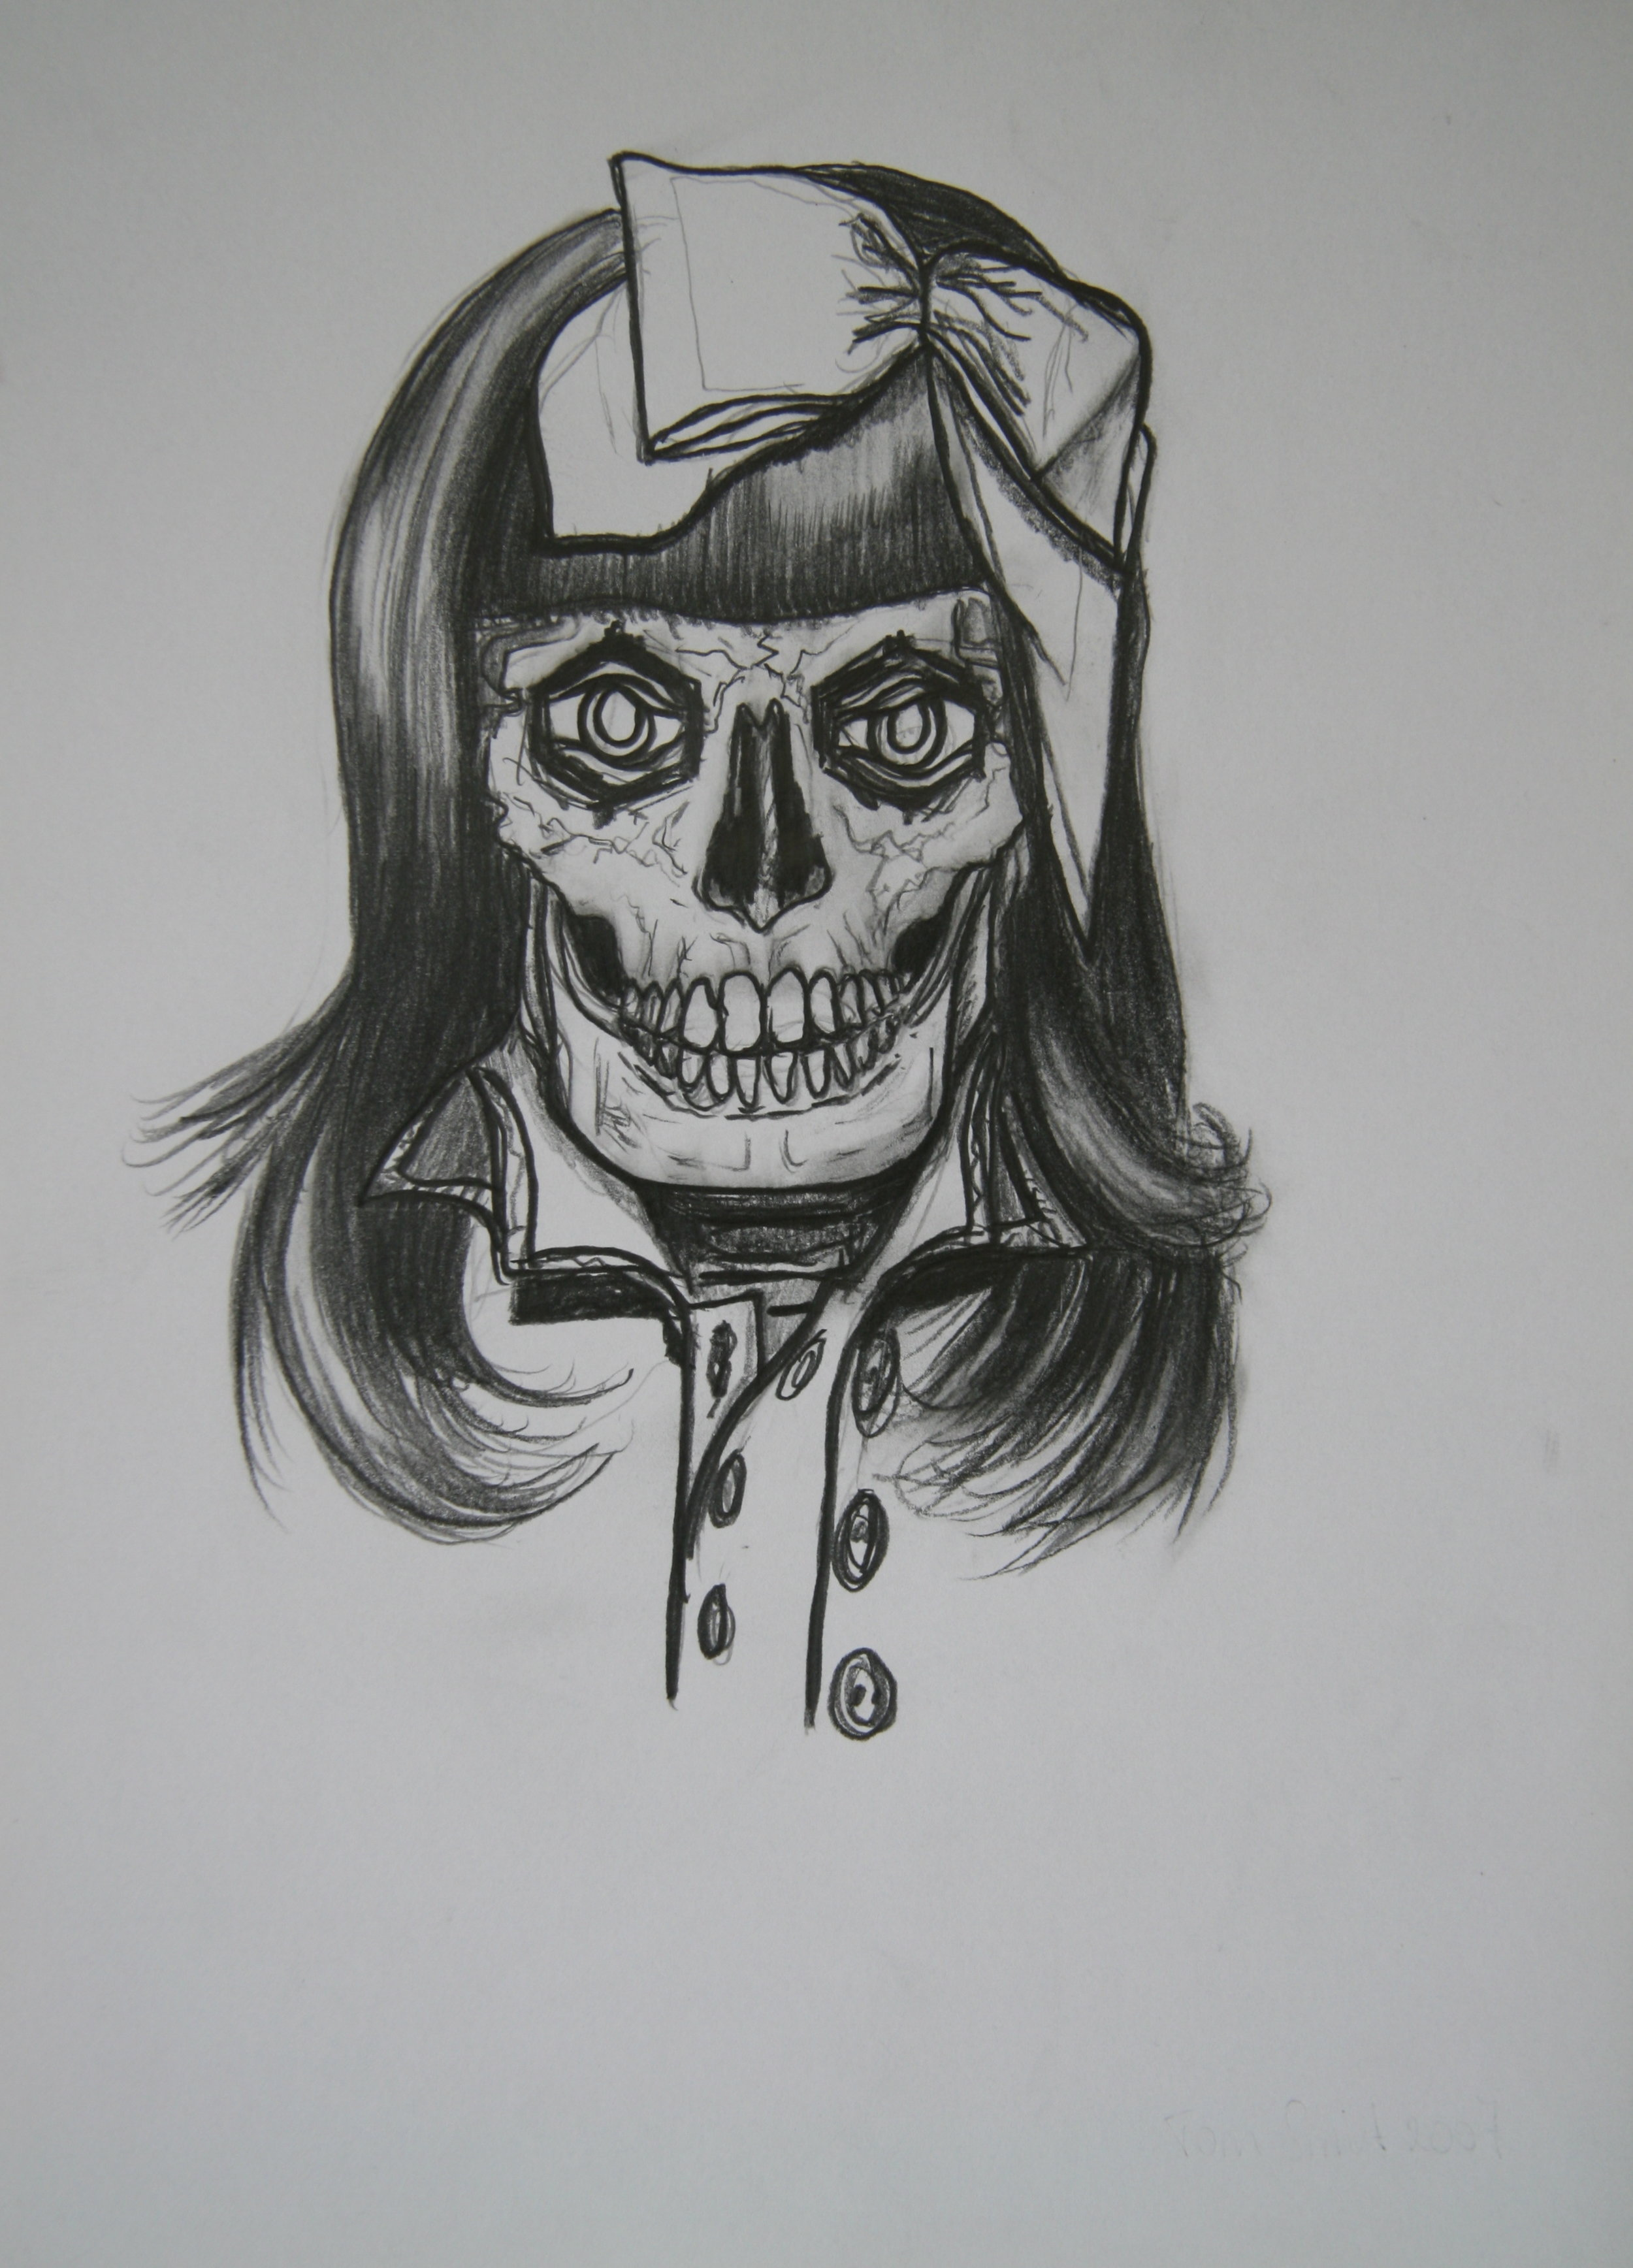 Skull 10, 30x21cm, pencil on paper